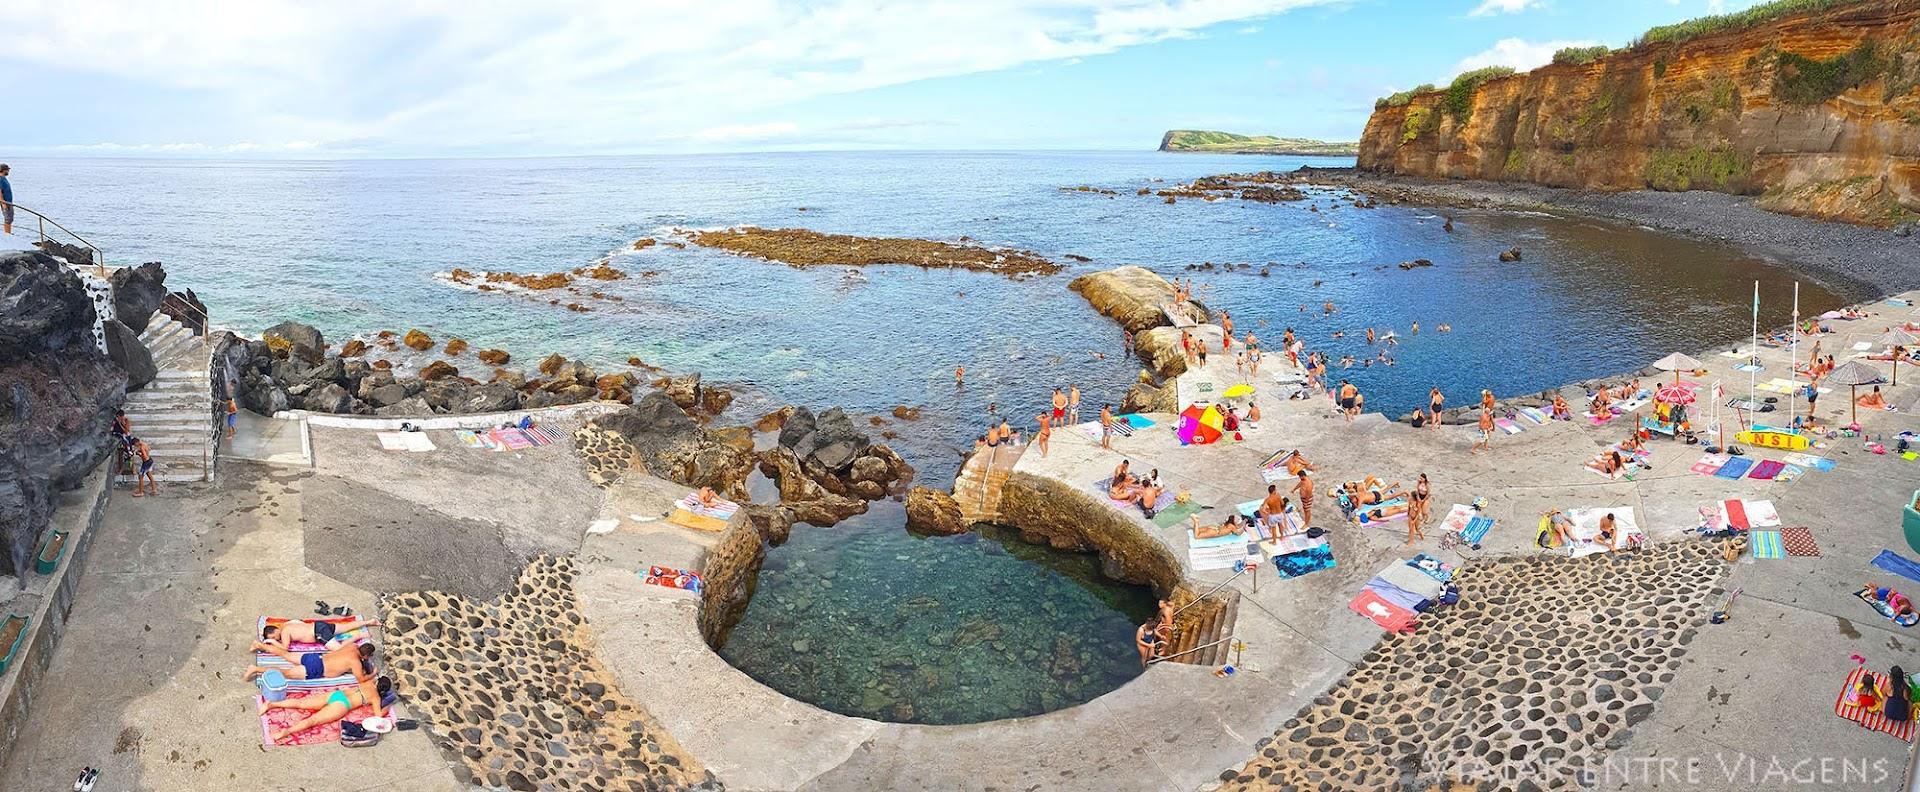 Passar a tarde na zona balnear das Escaleiras, na ilha Terceira